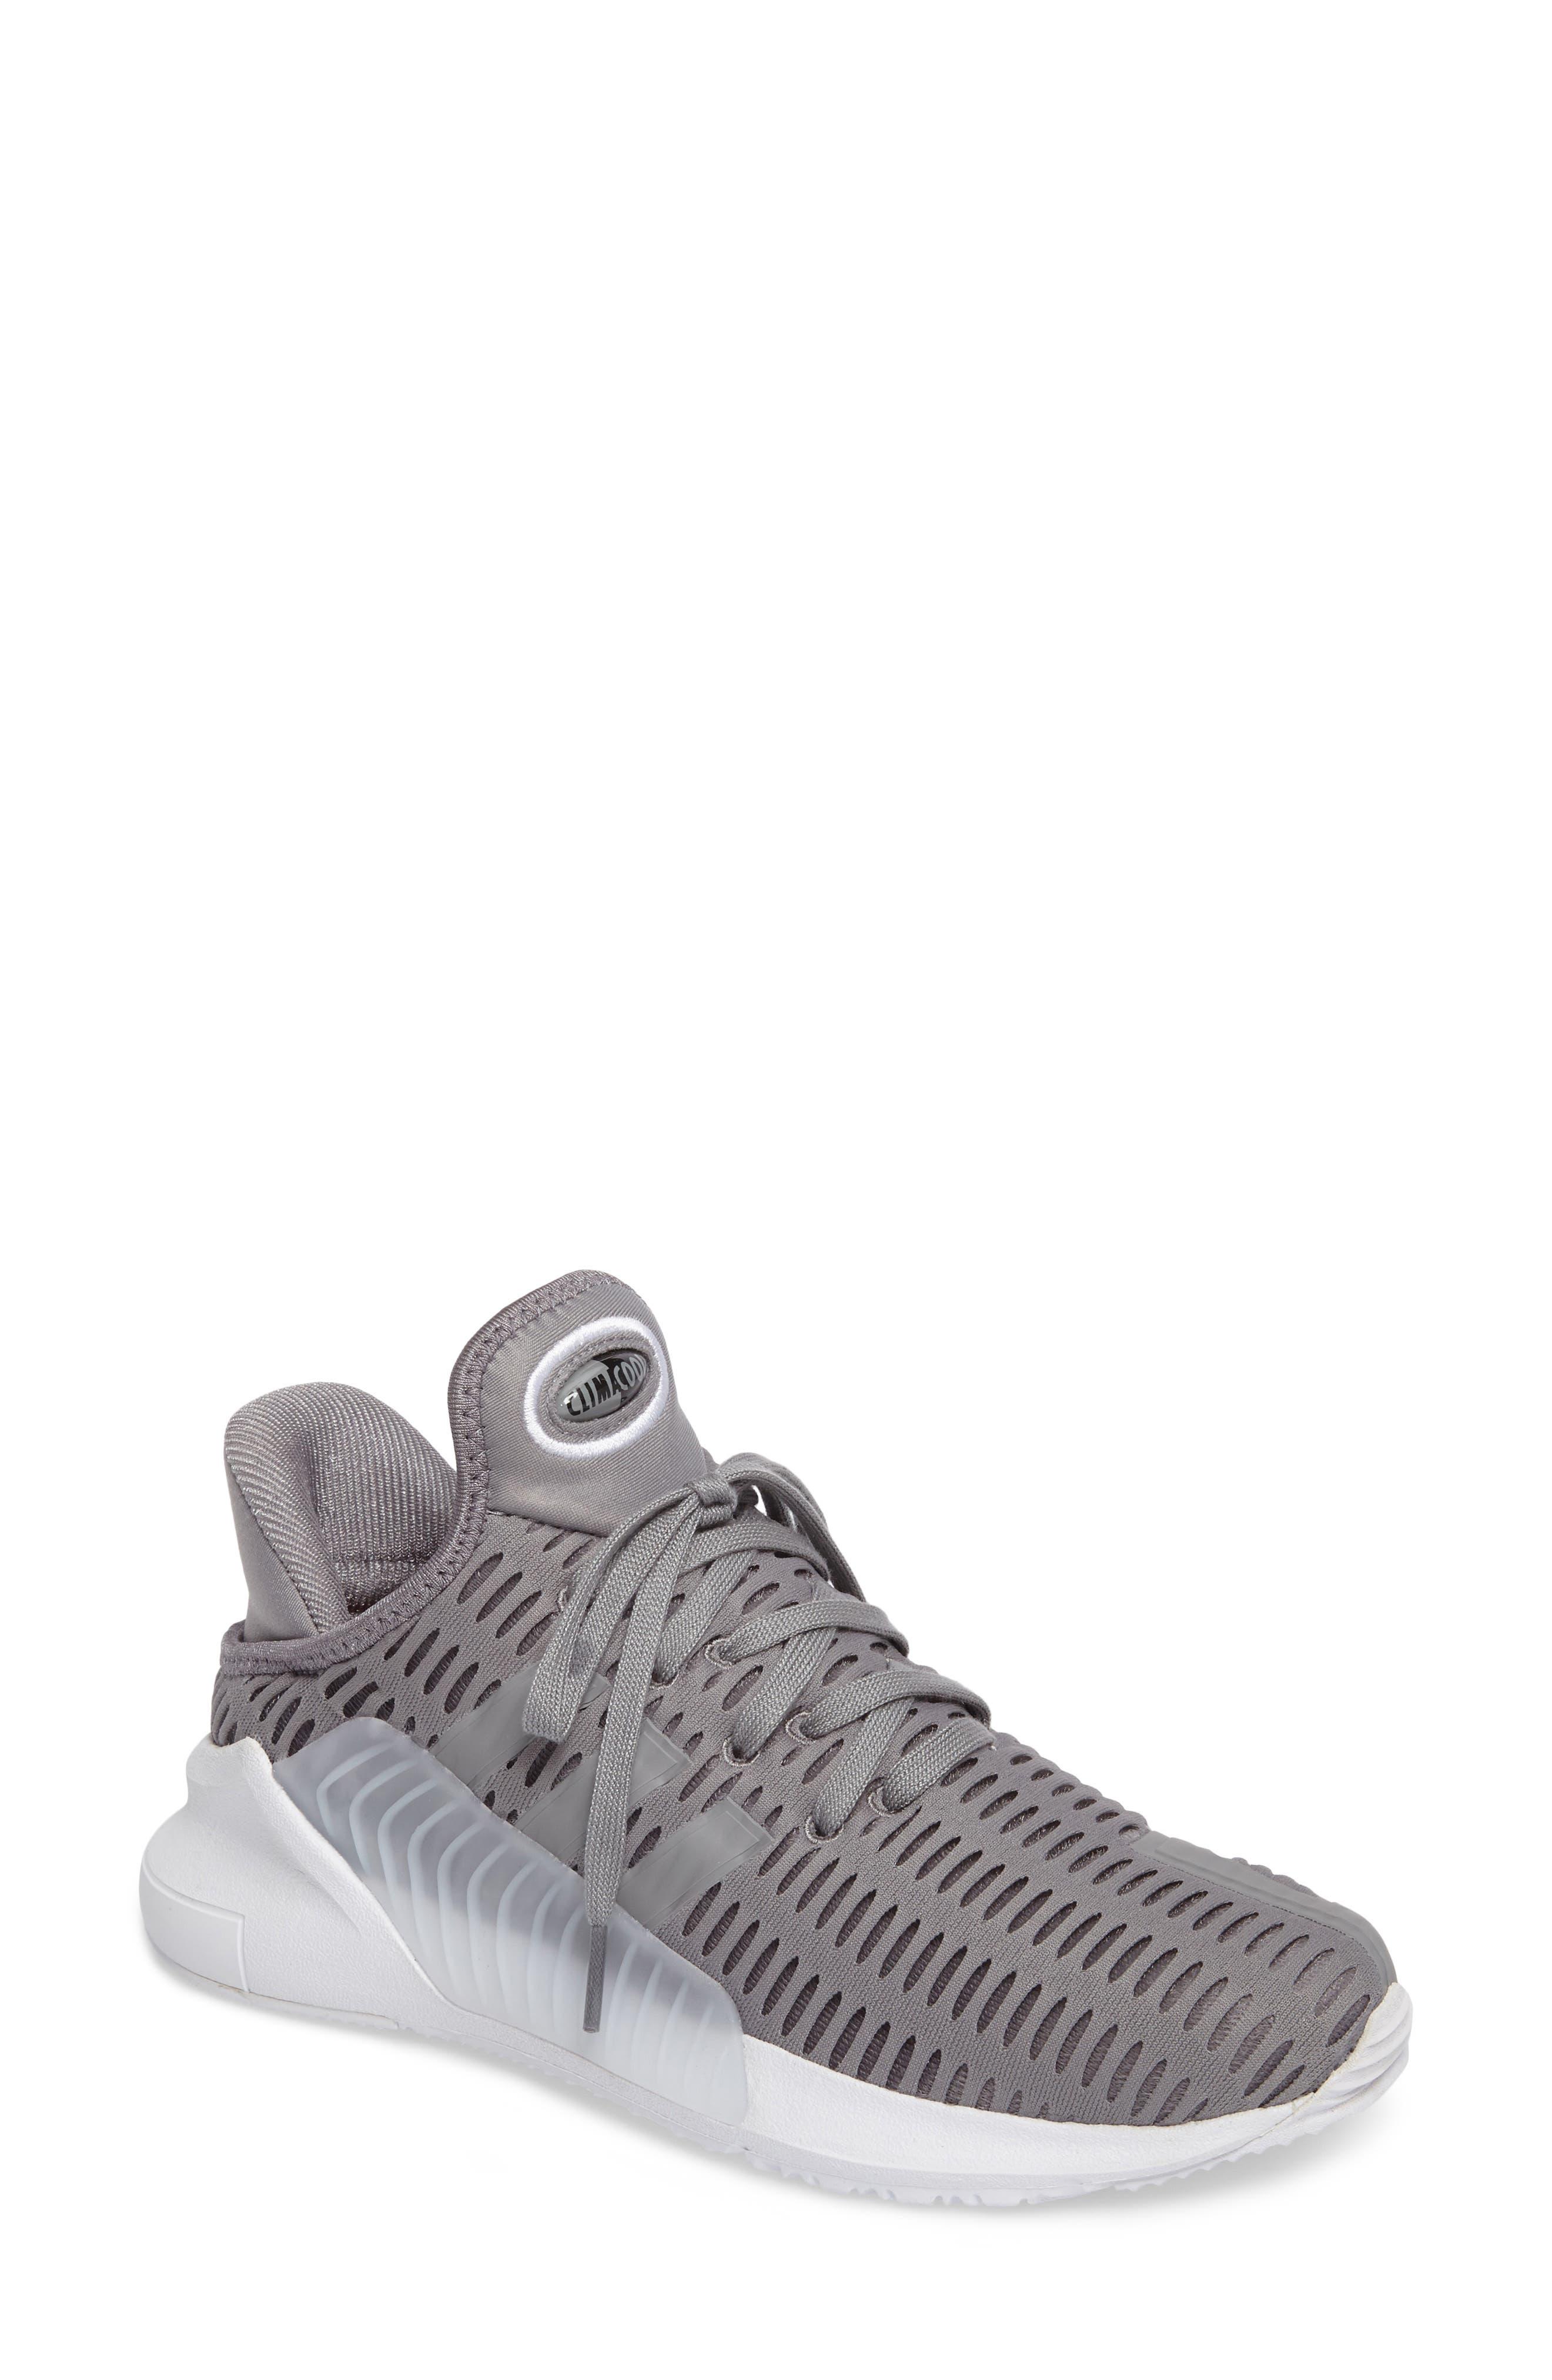 172390b236341 climacool adidas shoes - Travbeast